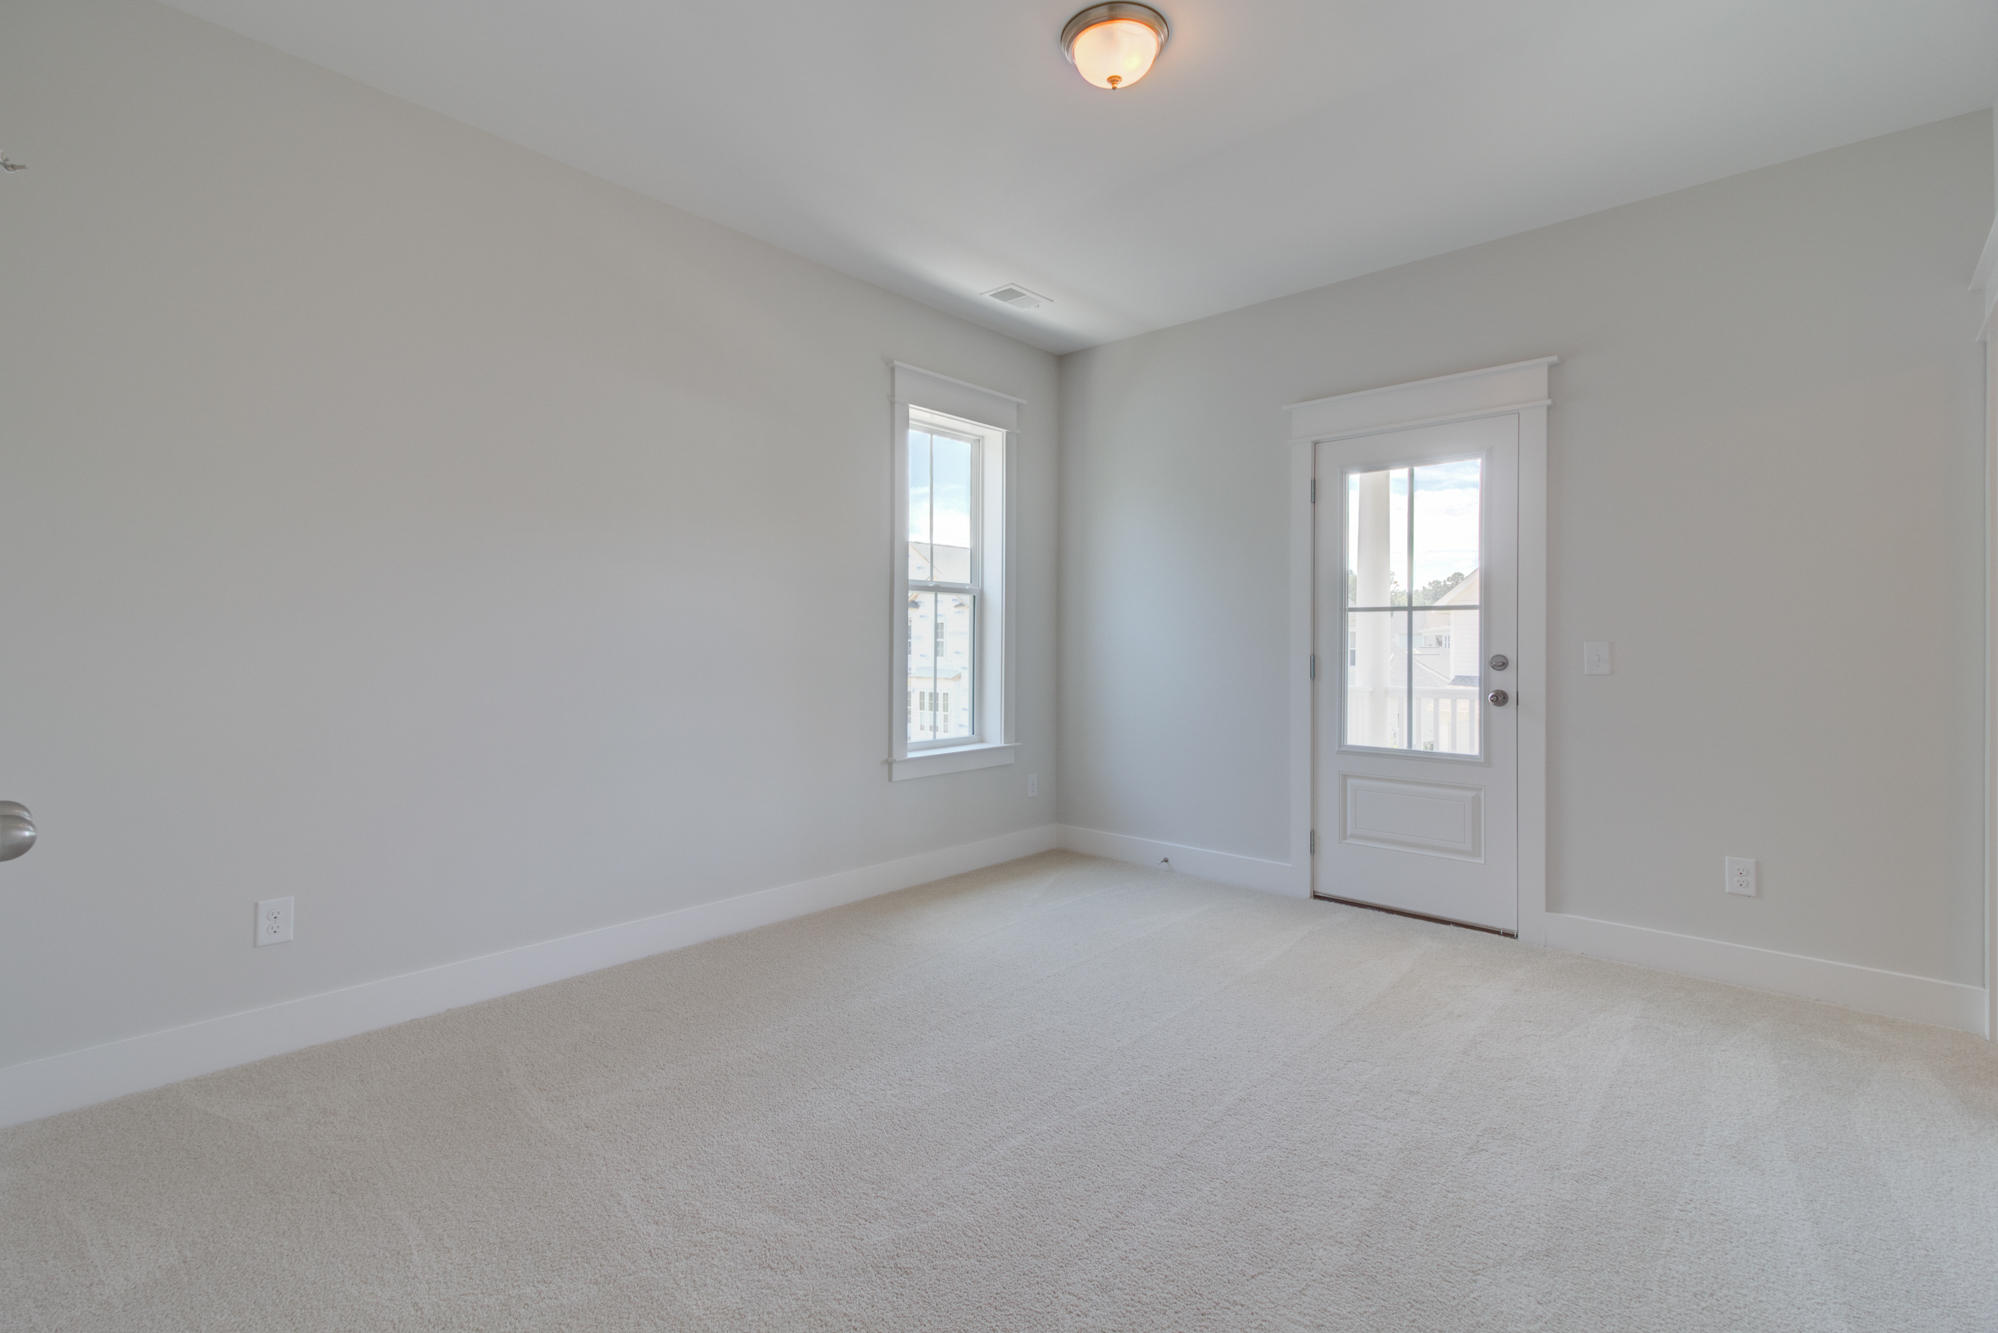 Carolina Park Homes For Sale - 3582 Backshore, Mount Pleasant, SC - 11